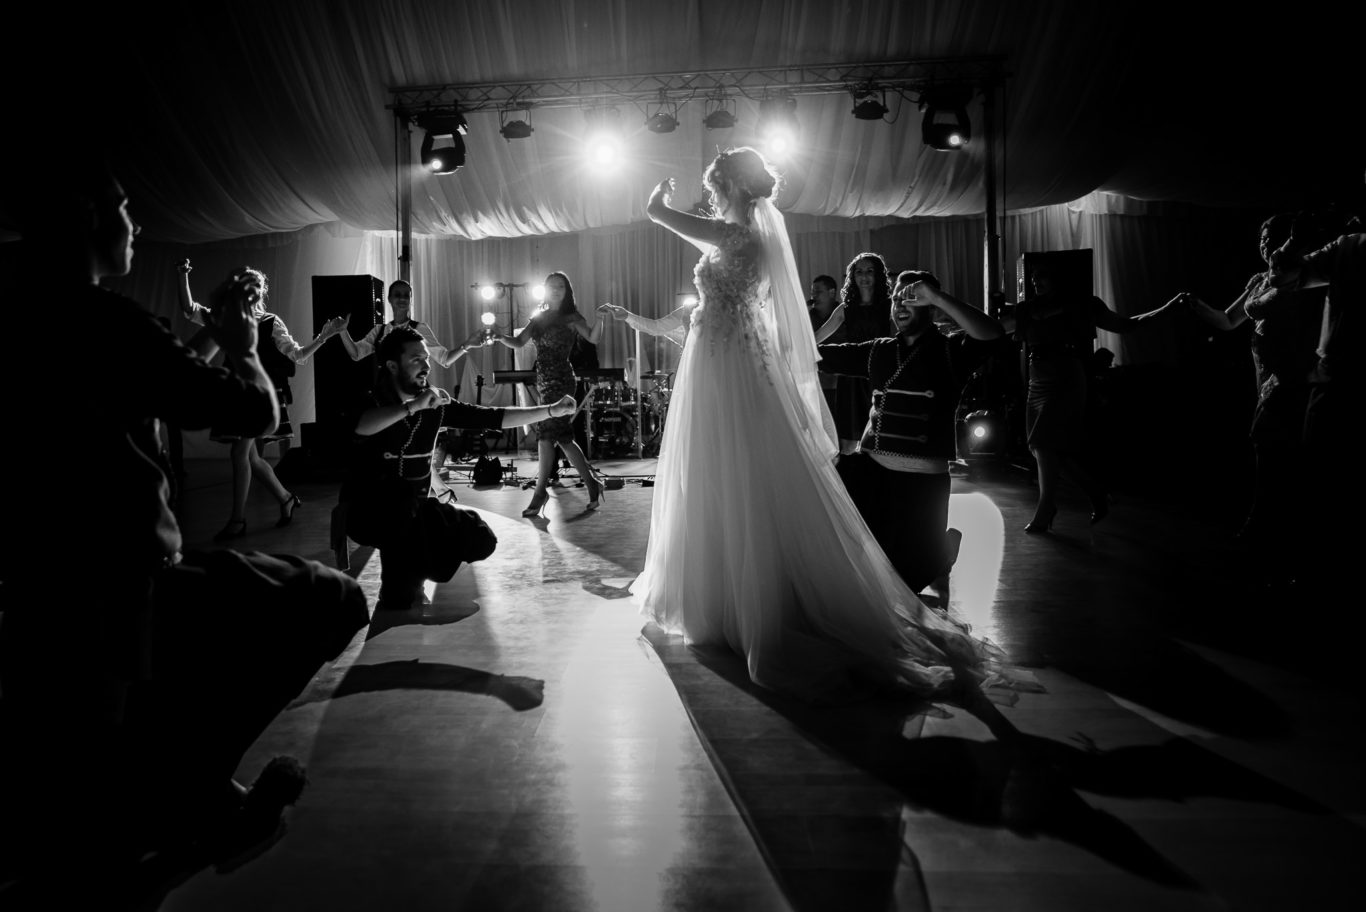 0569-Fotografie-nunta-Stirbey-Laura-Rares-fotograf-Ciprian-Dumitrescu-DSC_7681